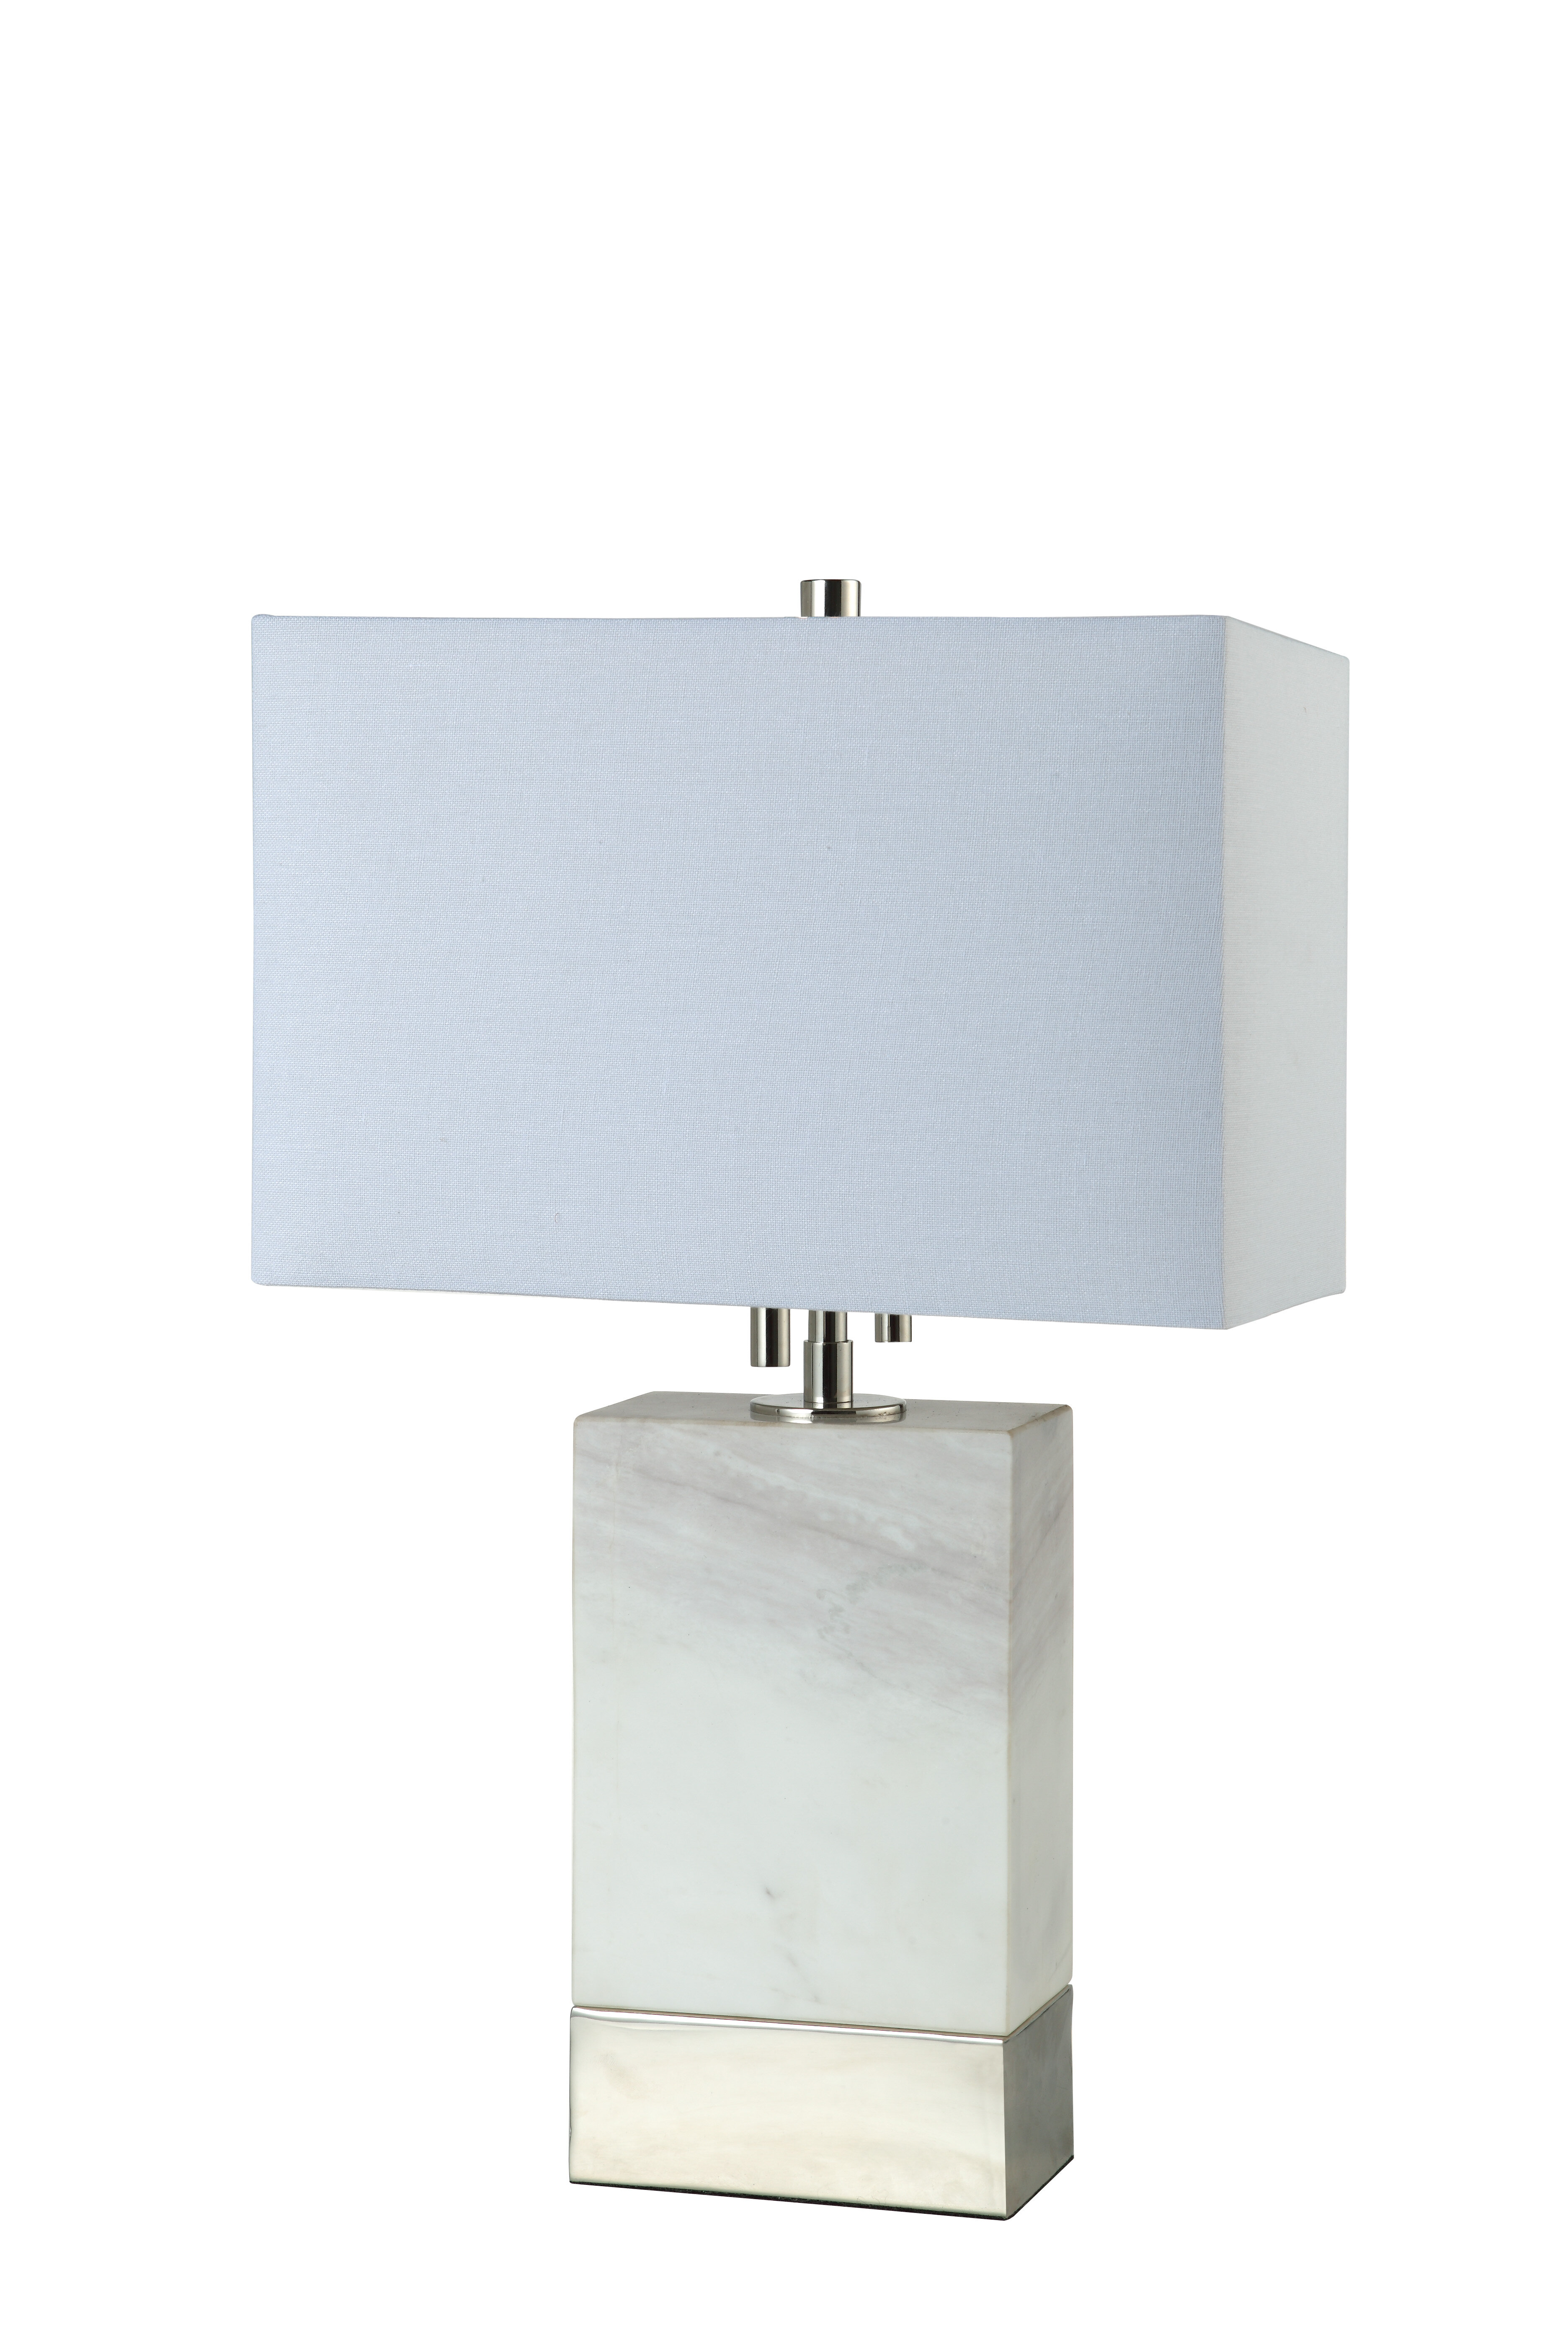 Decorators lighting allmodern rockport 20 table lamp keyboard keysfo Gallery